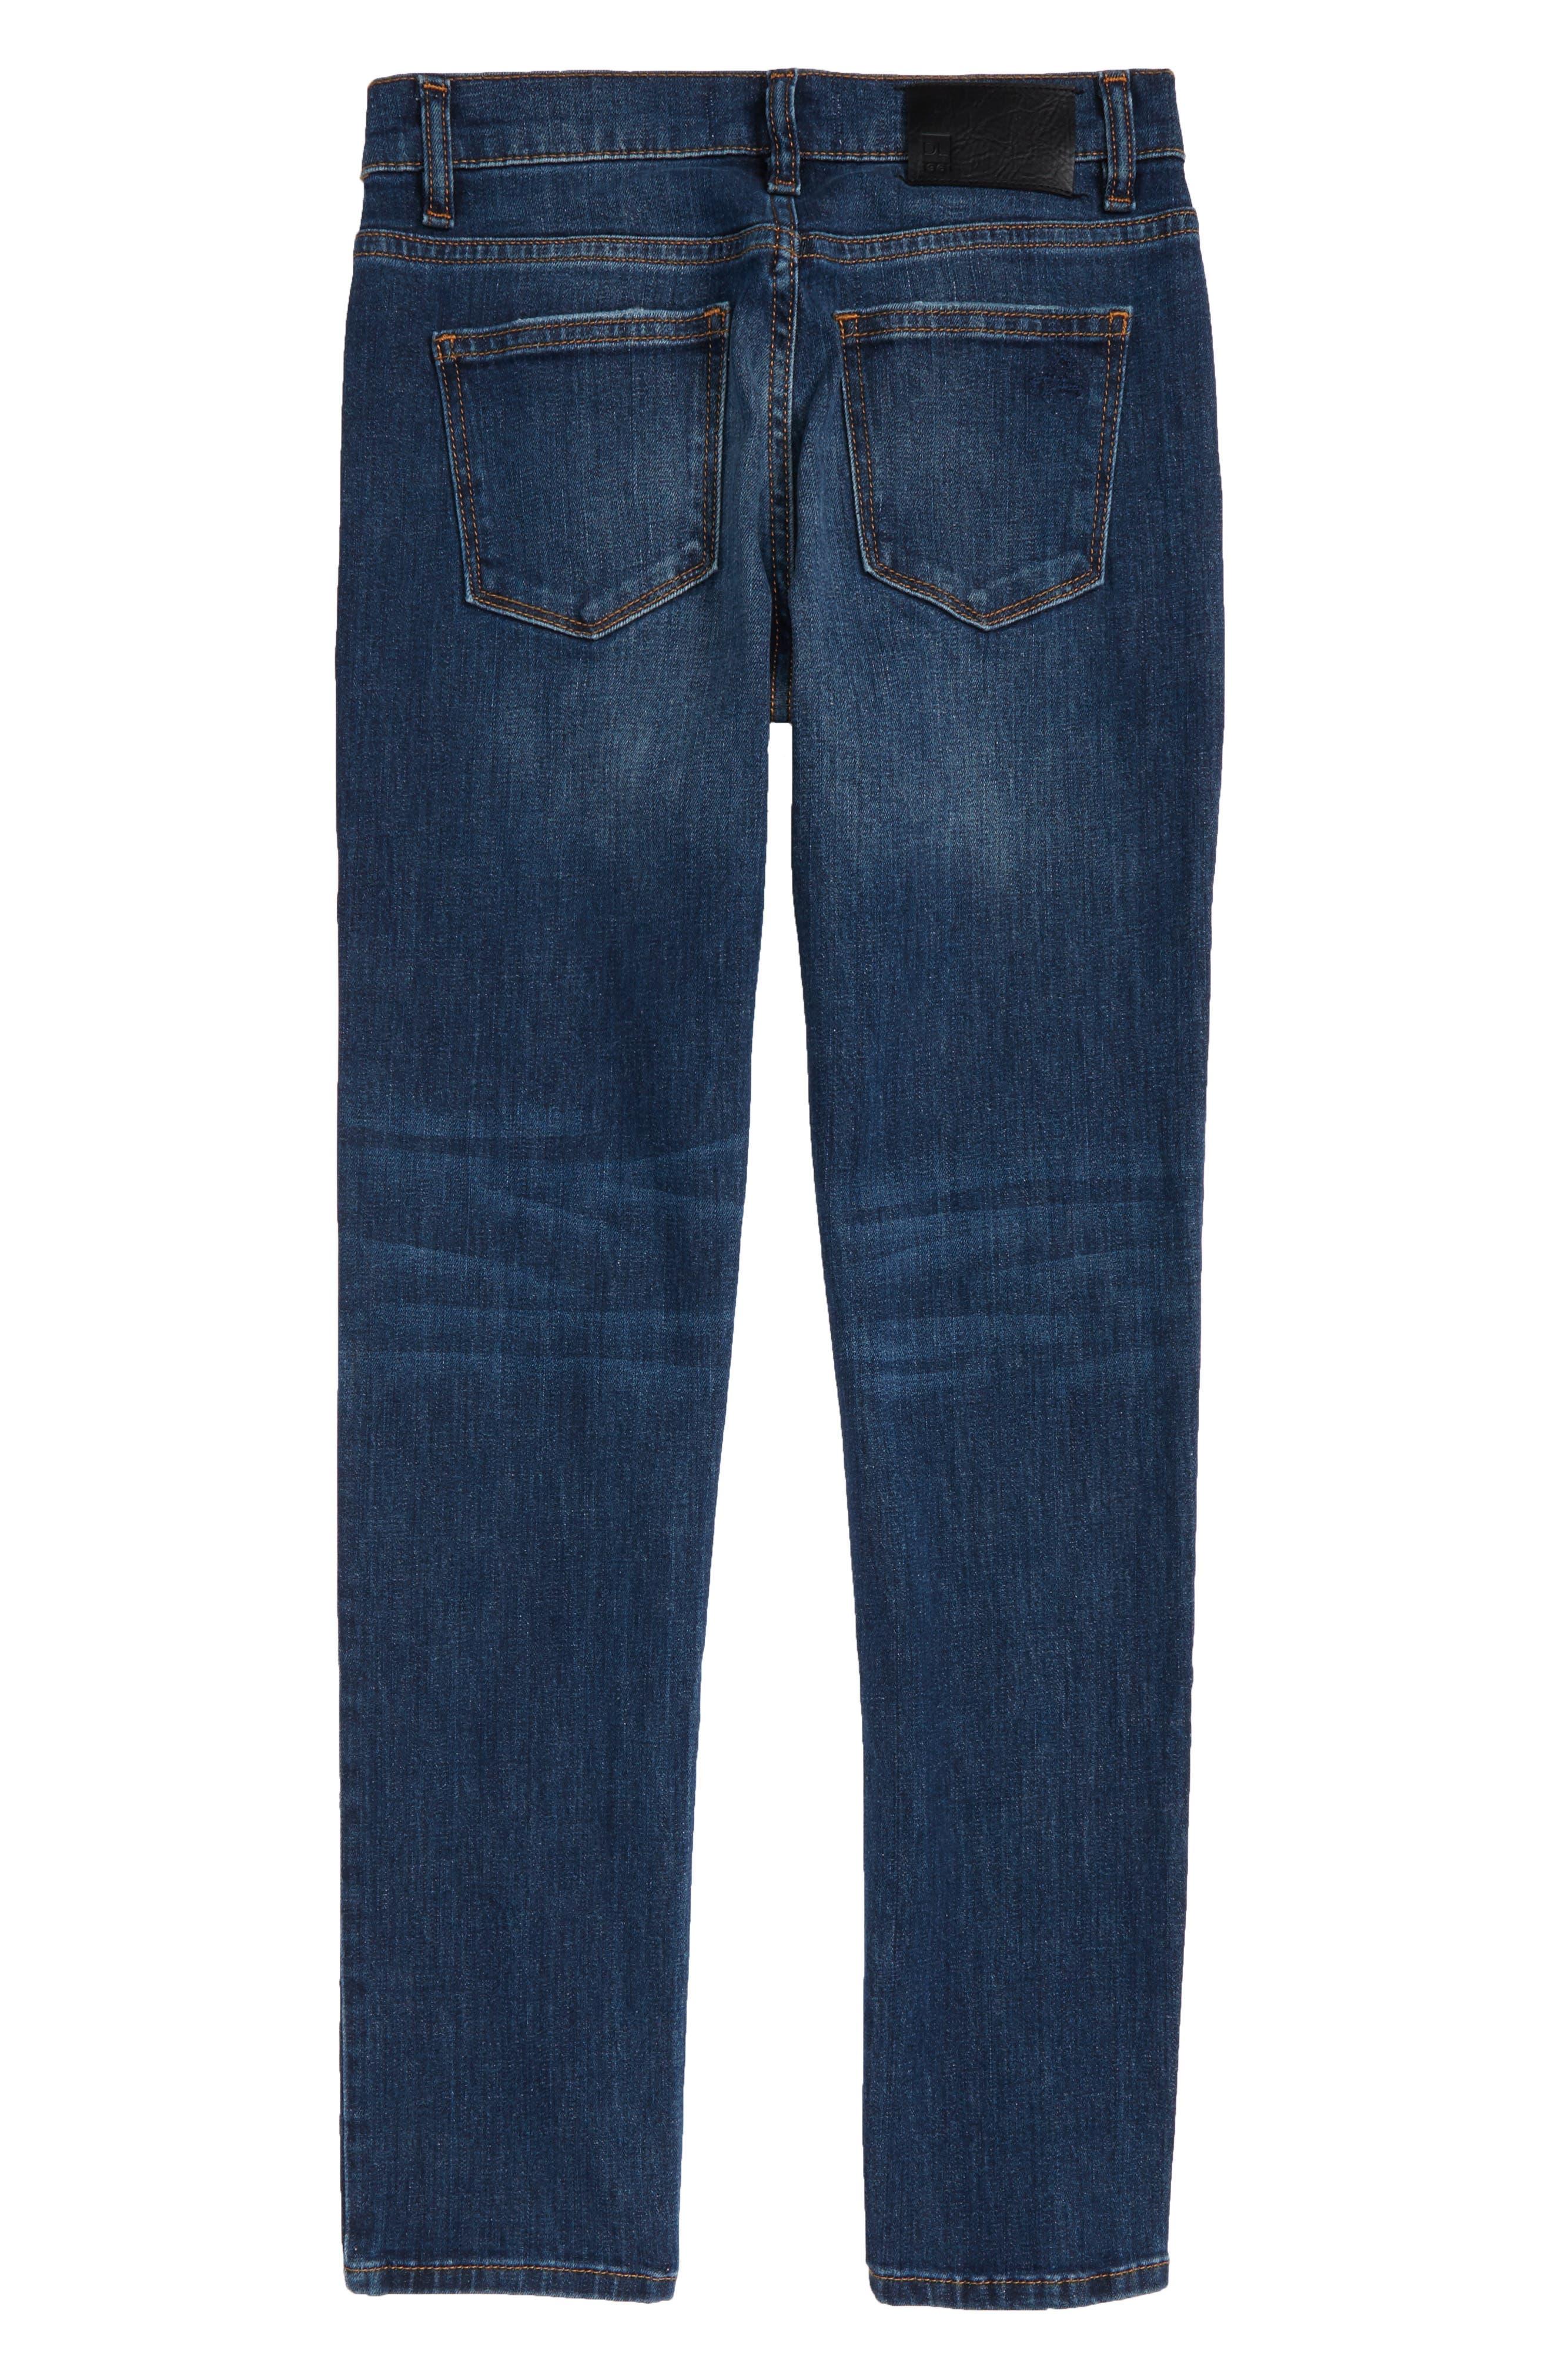 Hawke Skinny Jeans,                             Alternate thumbnail 2, color,                             425